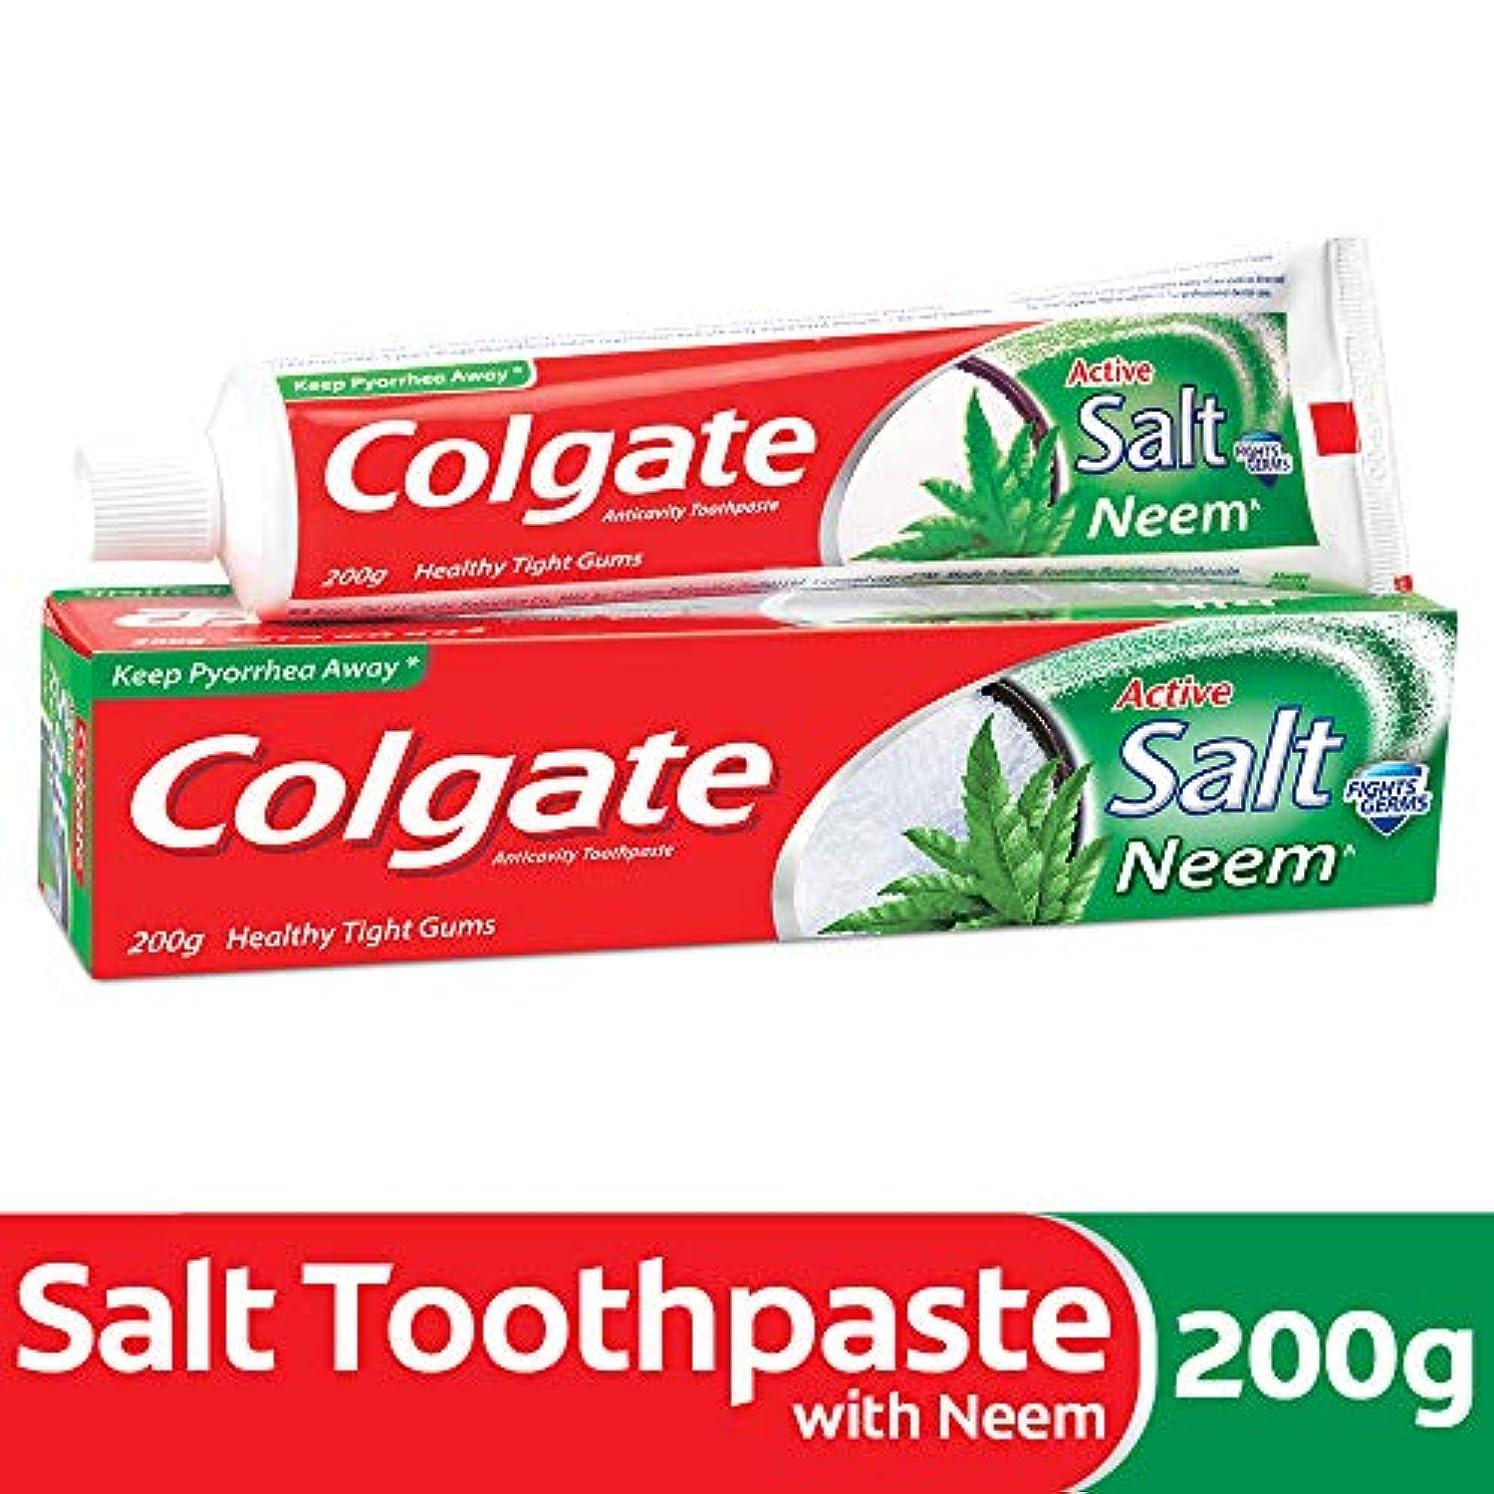 Colgate Active Salt Neem Anticavity Toothpaste - 200g